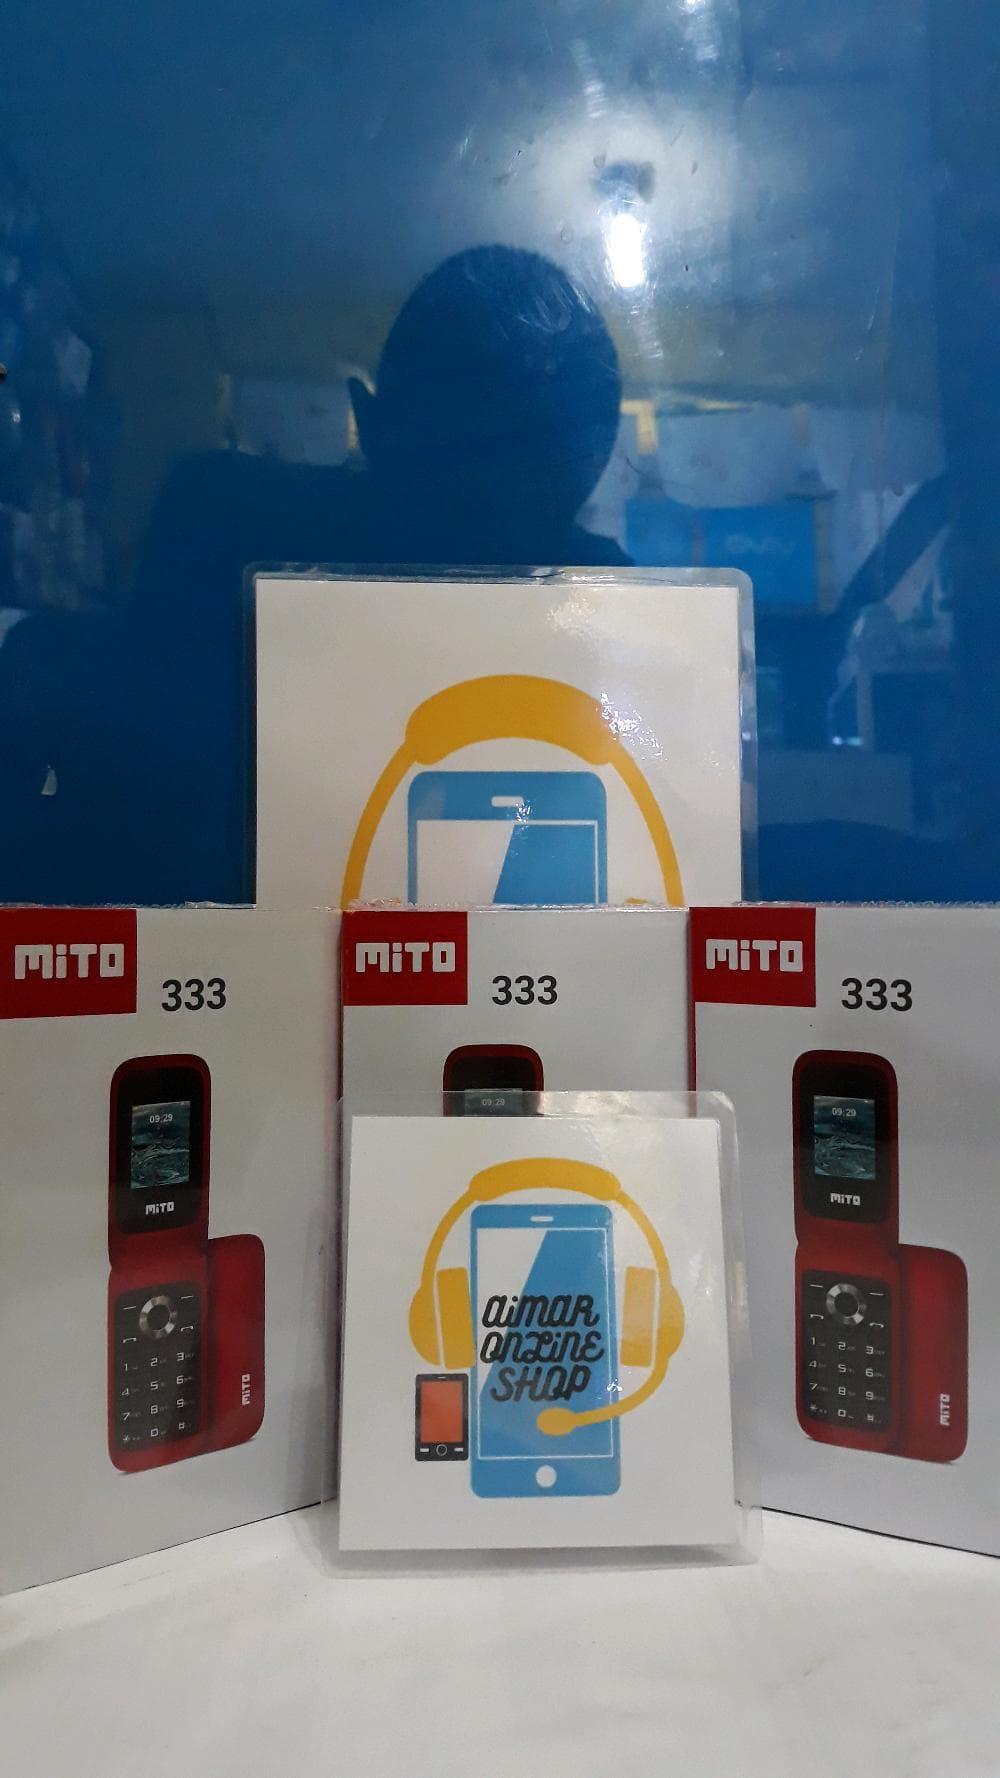 Harga Dan Spesifikasi Mito 268 Handphone Merah Update 2018 Maxtron Mg 361 Ello Jual 333 Hp Lipat Murah Garansi Resmi Hpmurahshop Tokopedia